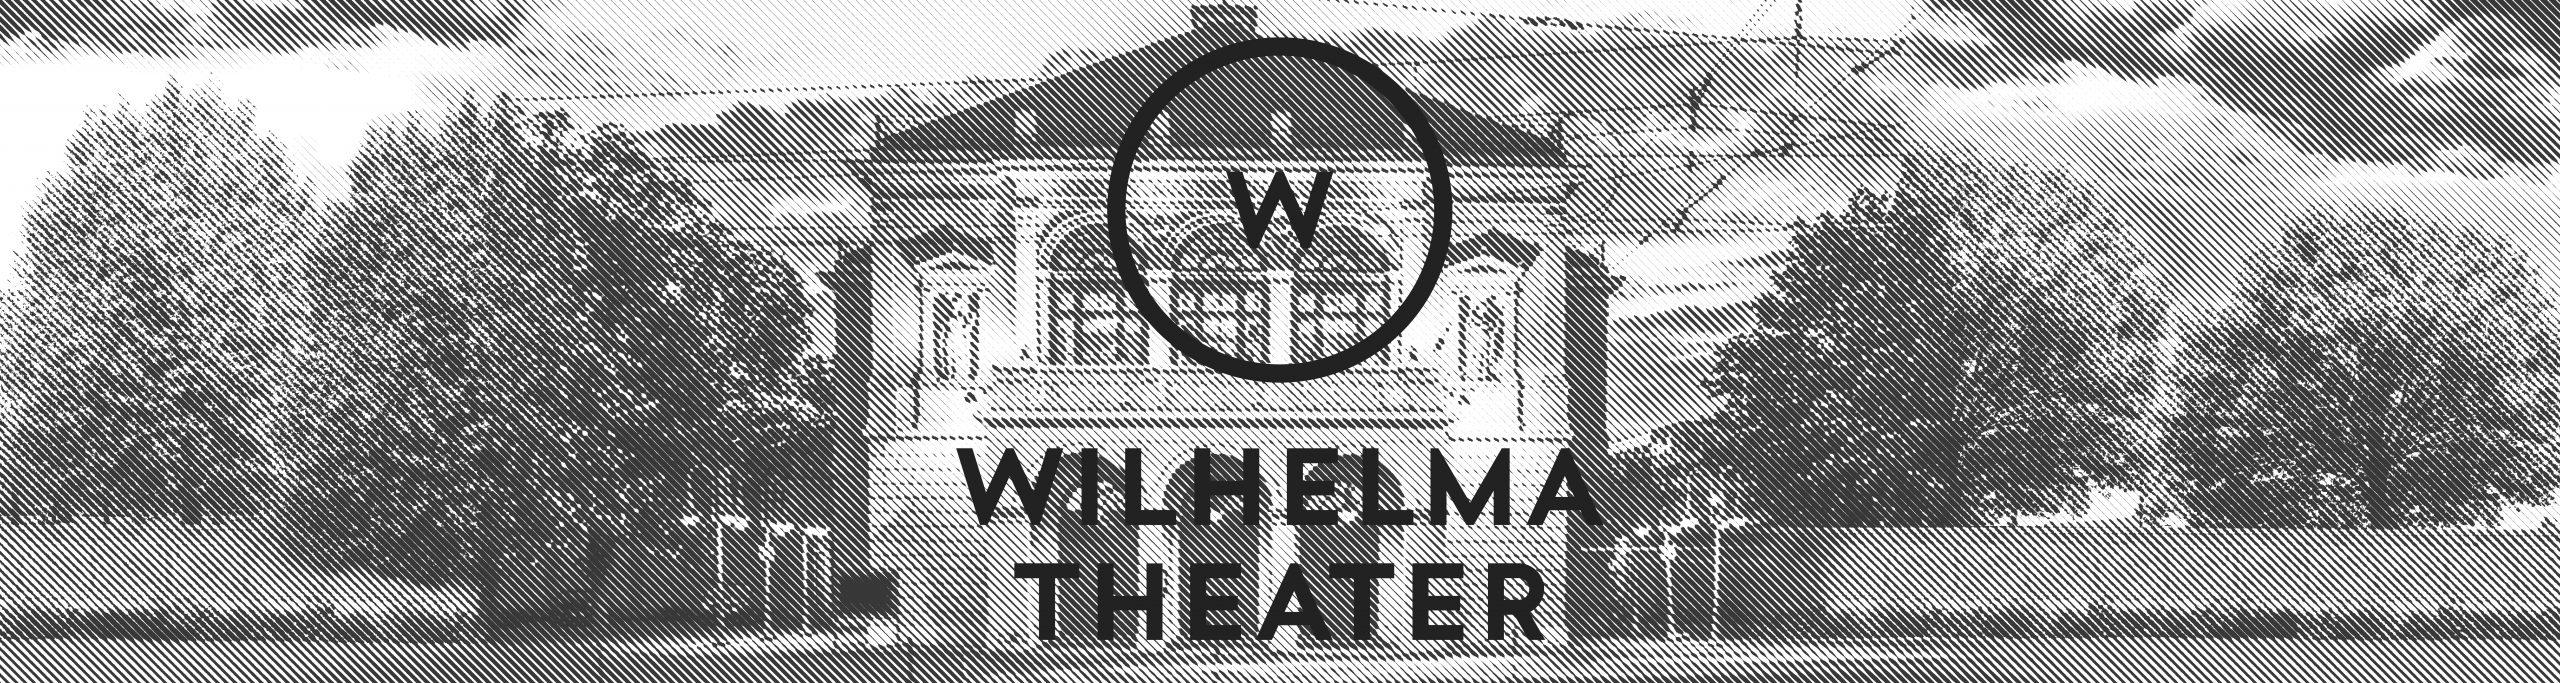 wilhelma-theater_Start_by_Majormajor